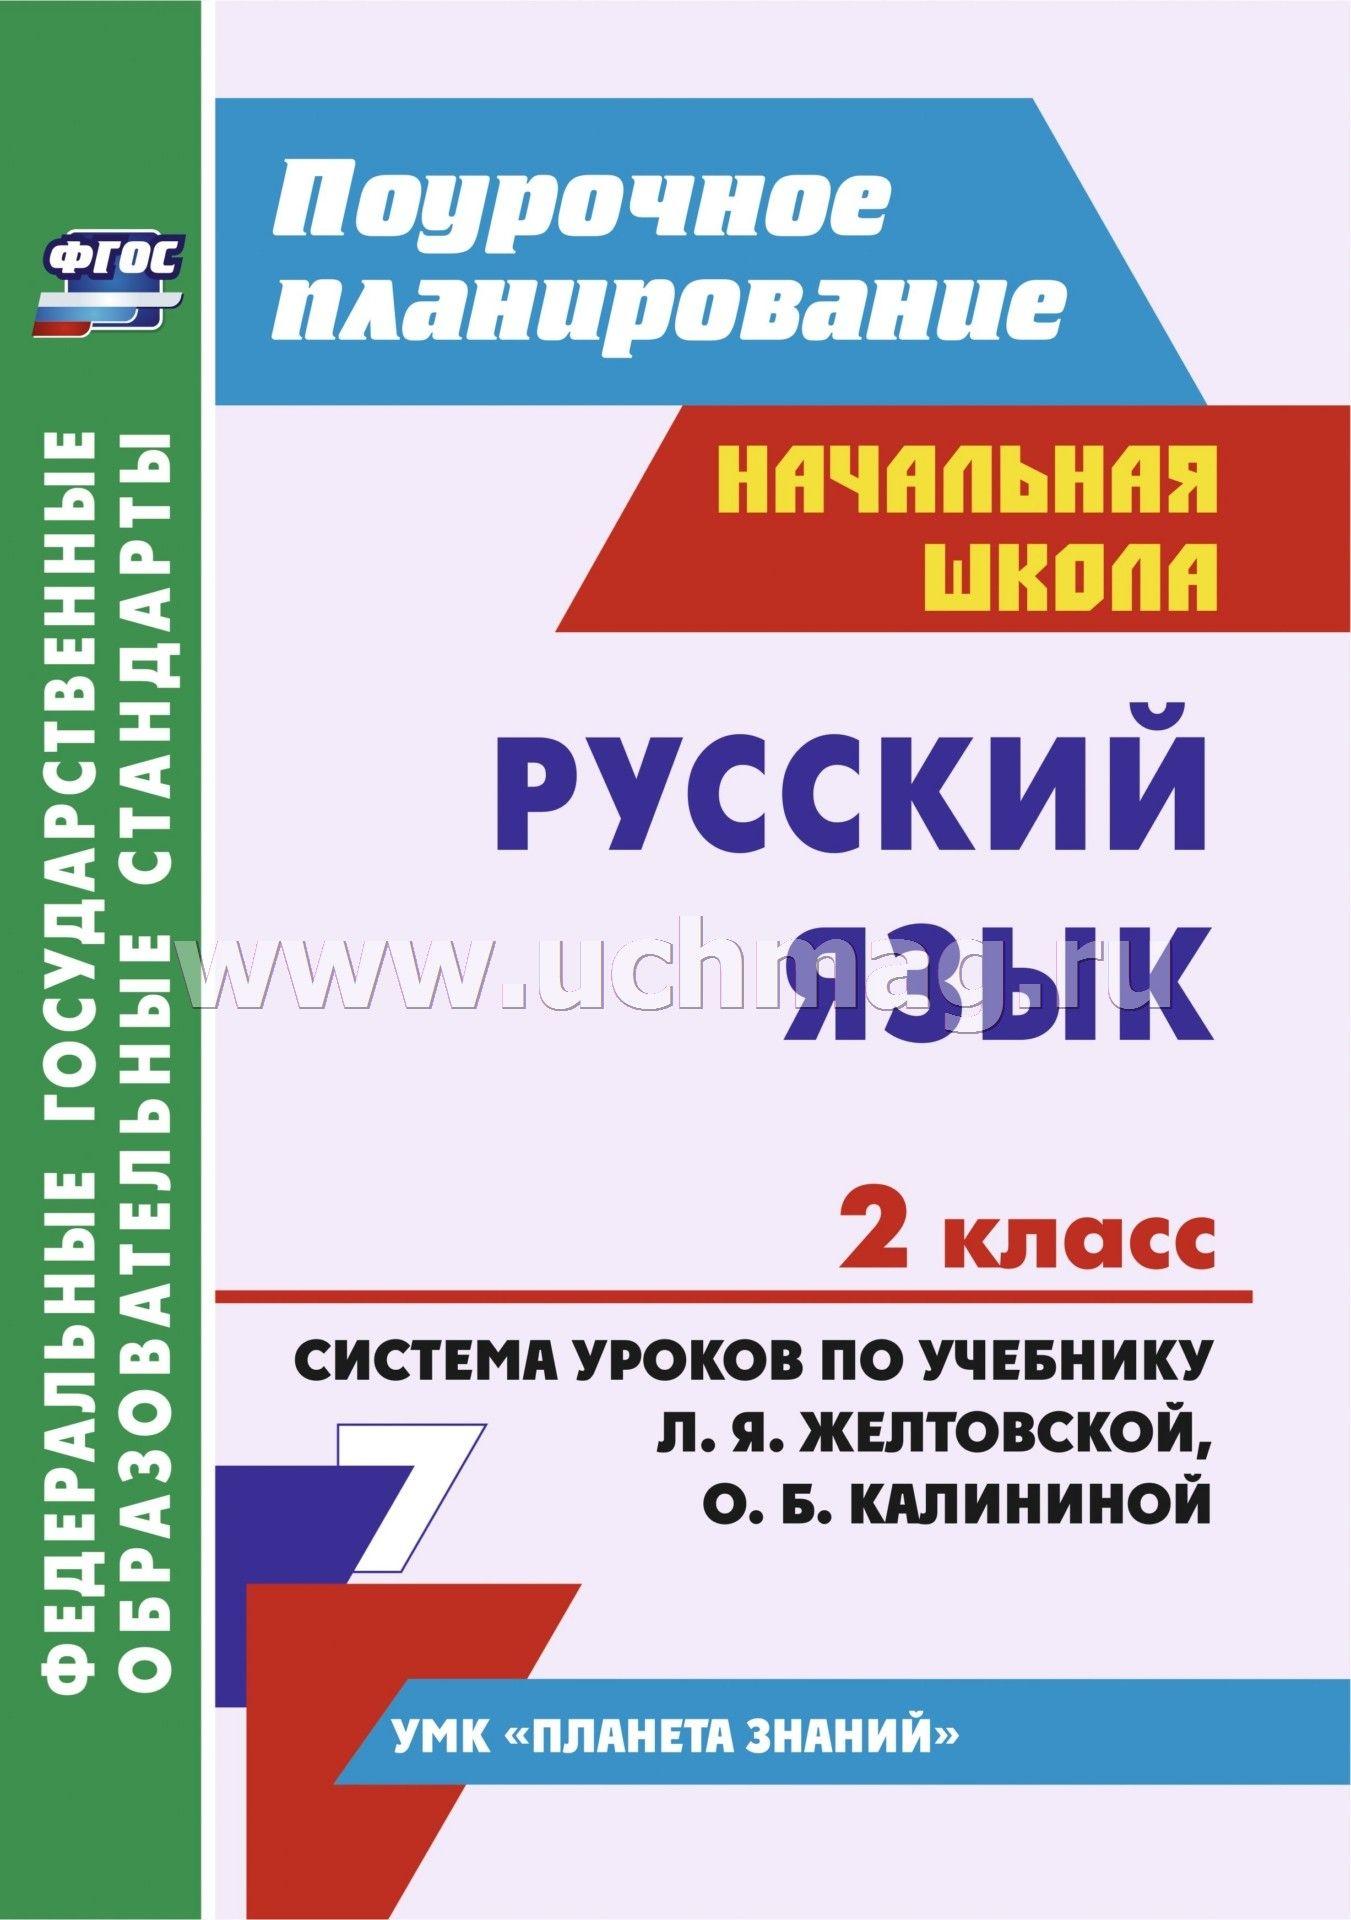 Русский язык 2 класс по программе иванова и евдокимова тема приставка